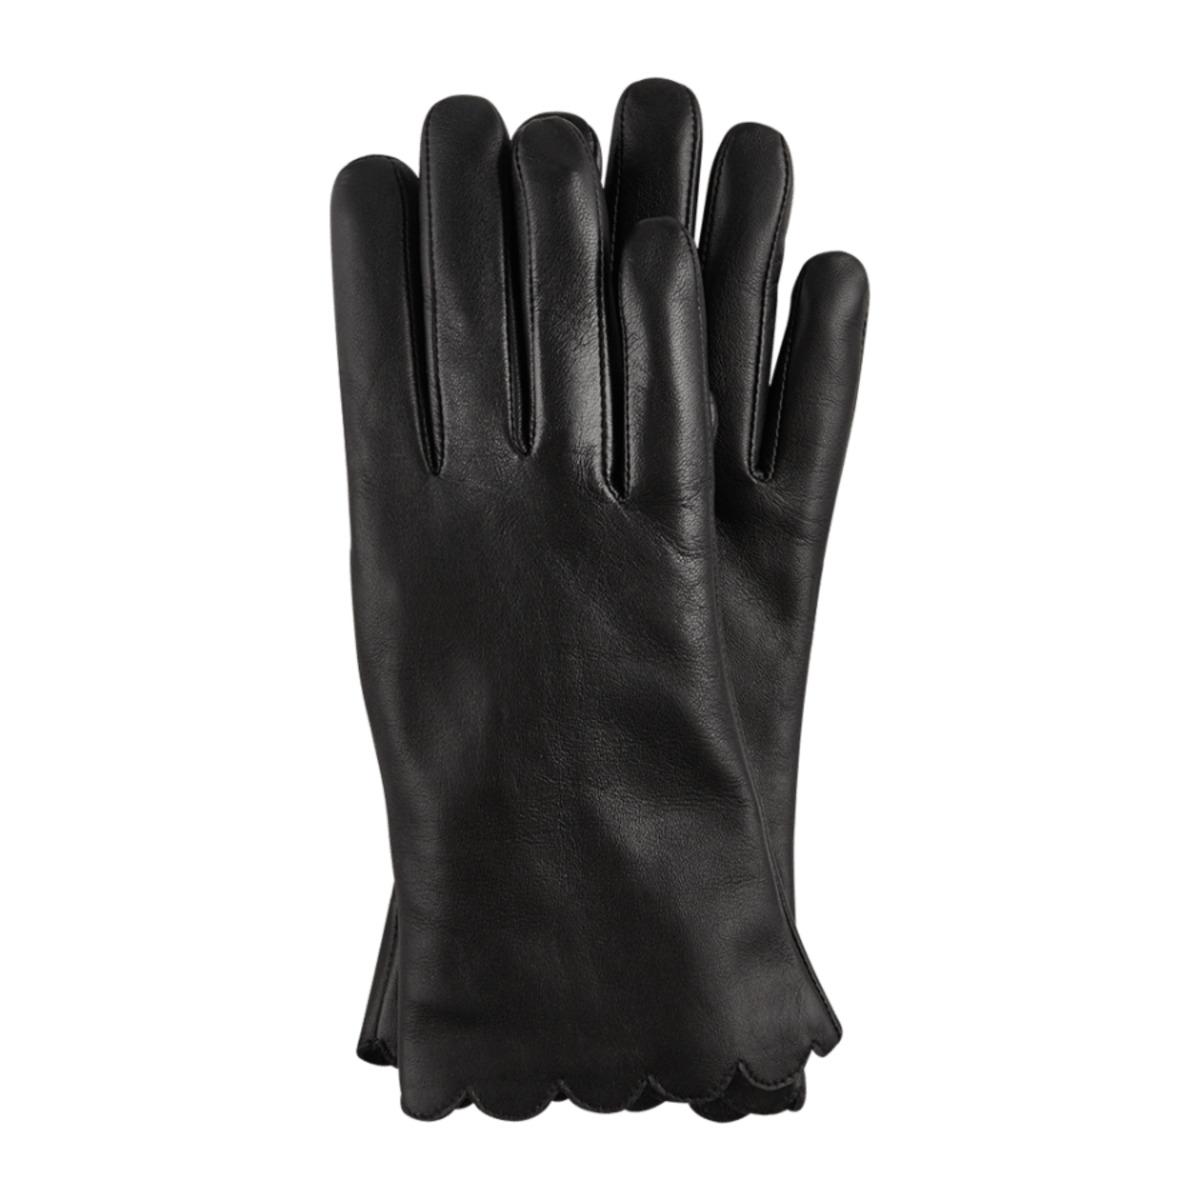 Bild 4 von ROYAL LIFE     Leder-Handschuhe